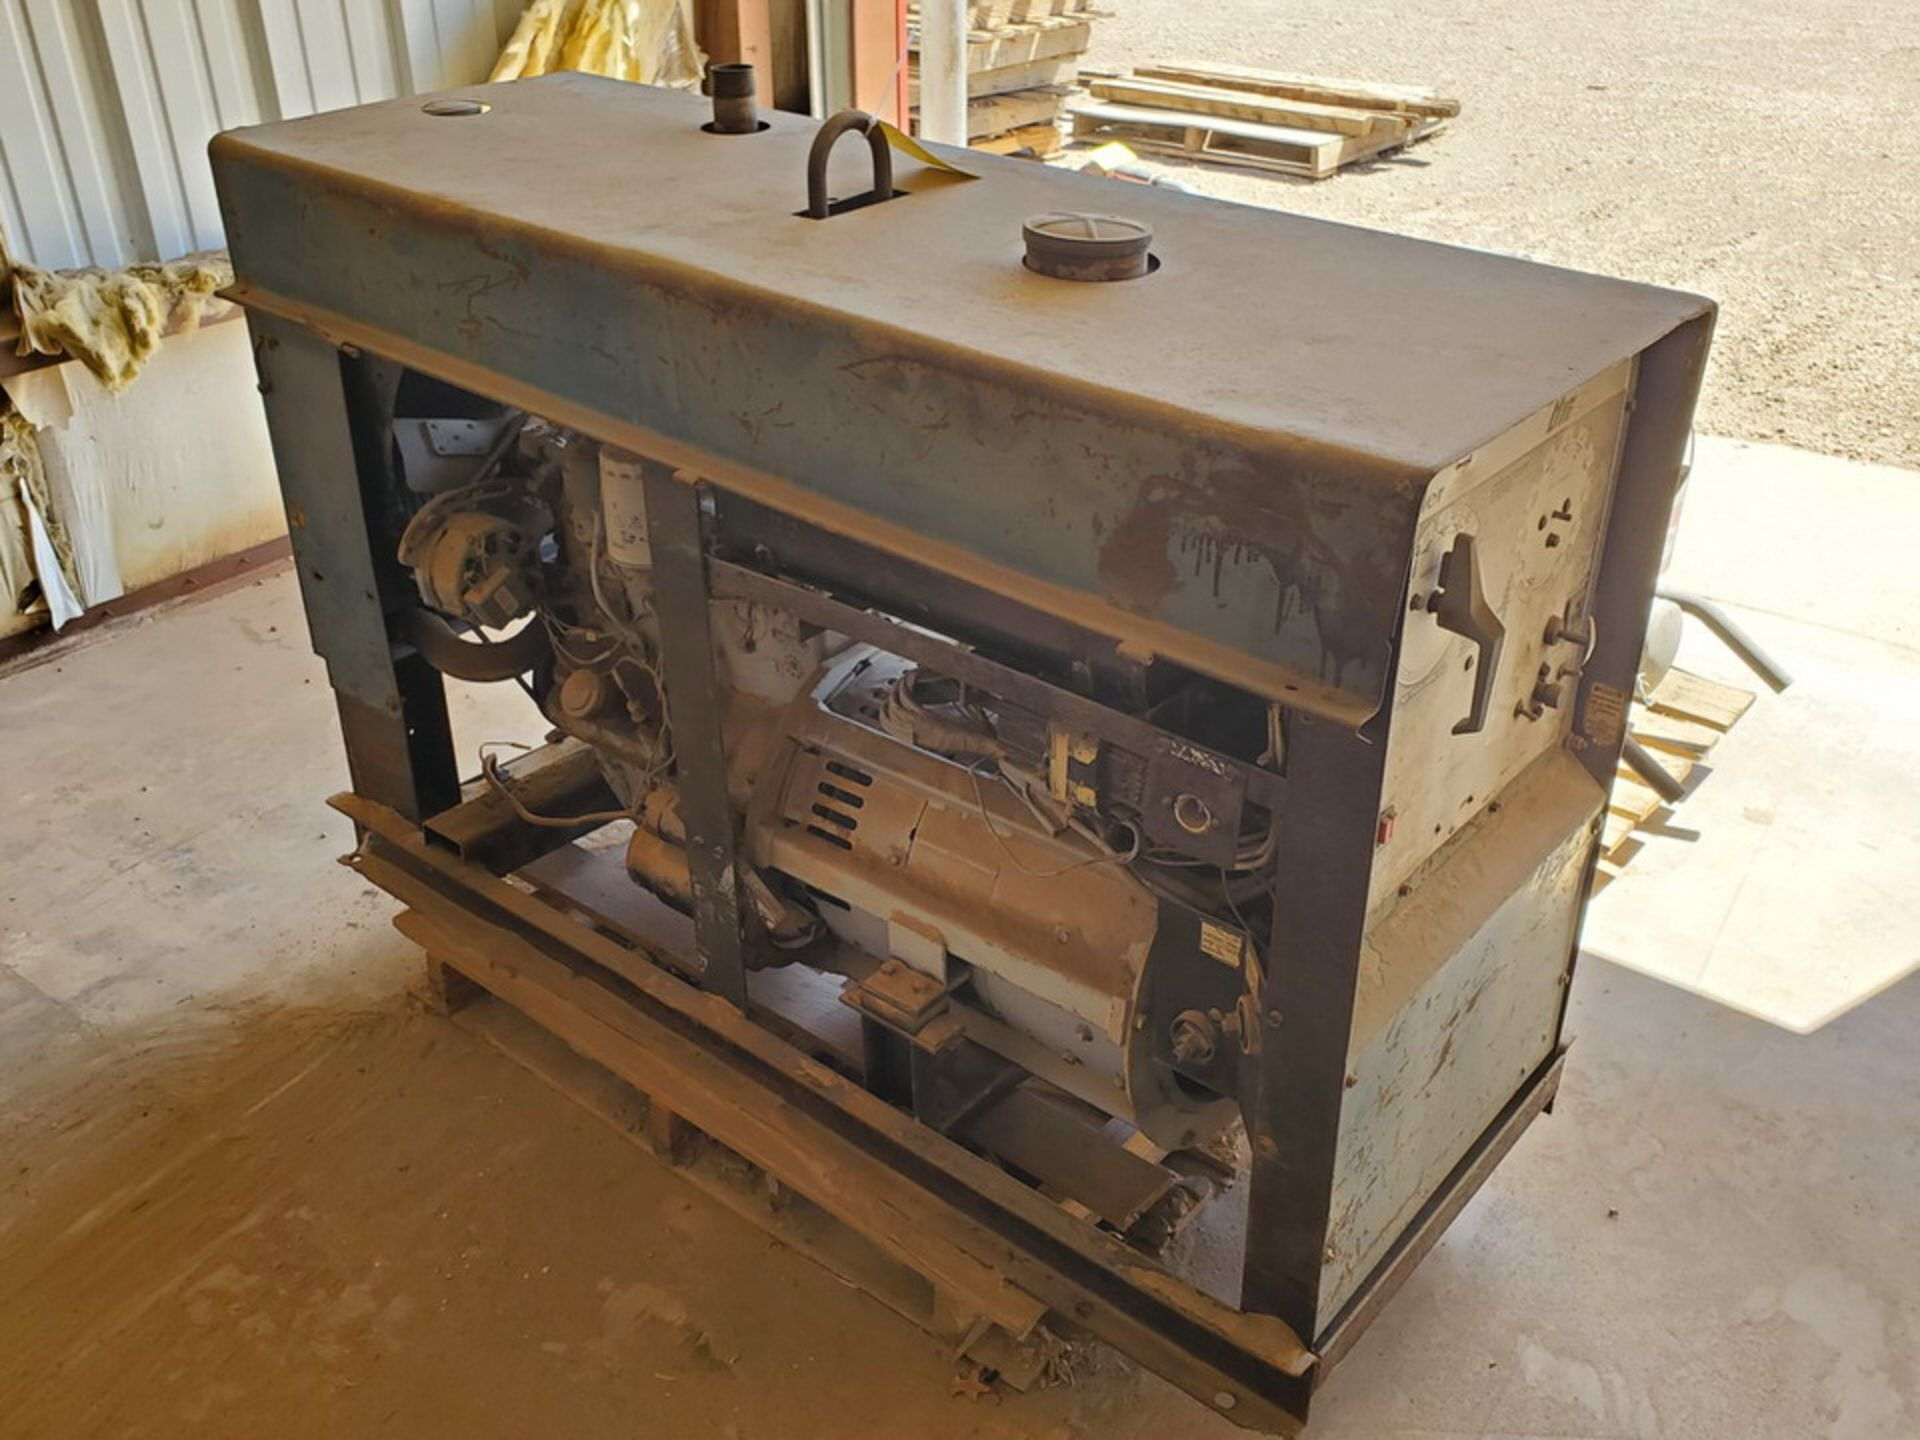 Miller Big 20 Welder Generator CC/DC: 20-750A, CC/AC: 20-575A - Image 4 of 8